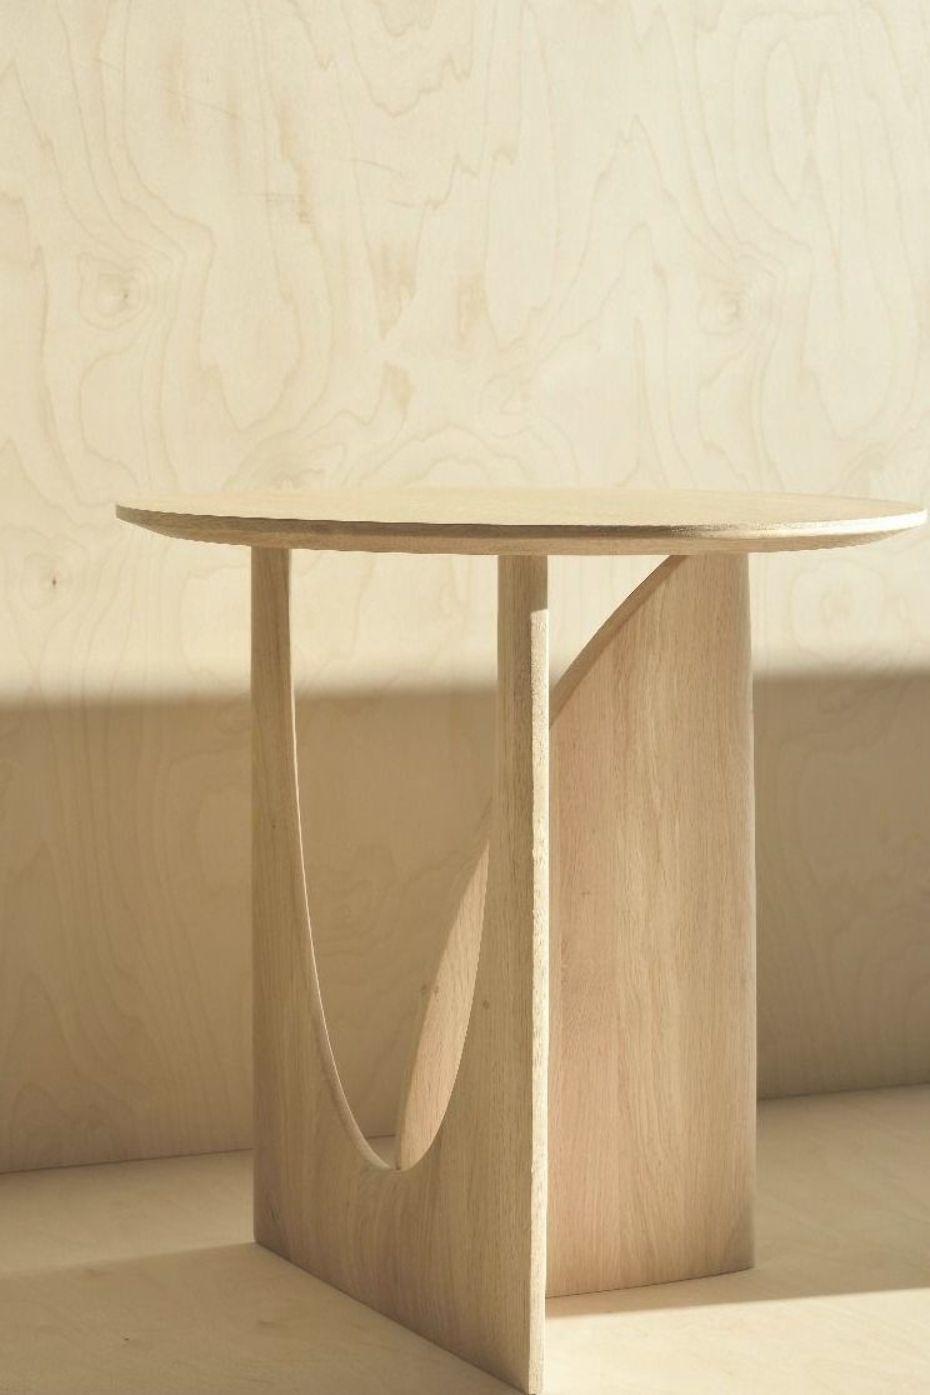 Geometric Side Table Oak Modernes Mobeldesign Beistelltische Dekor